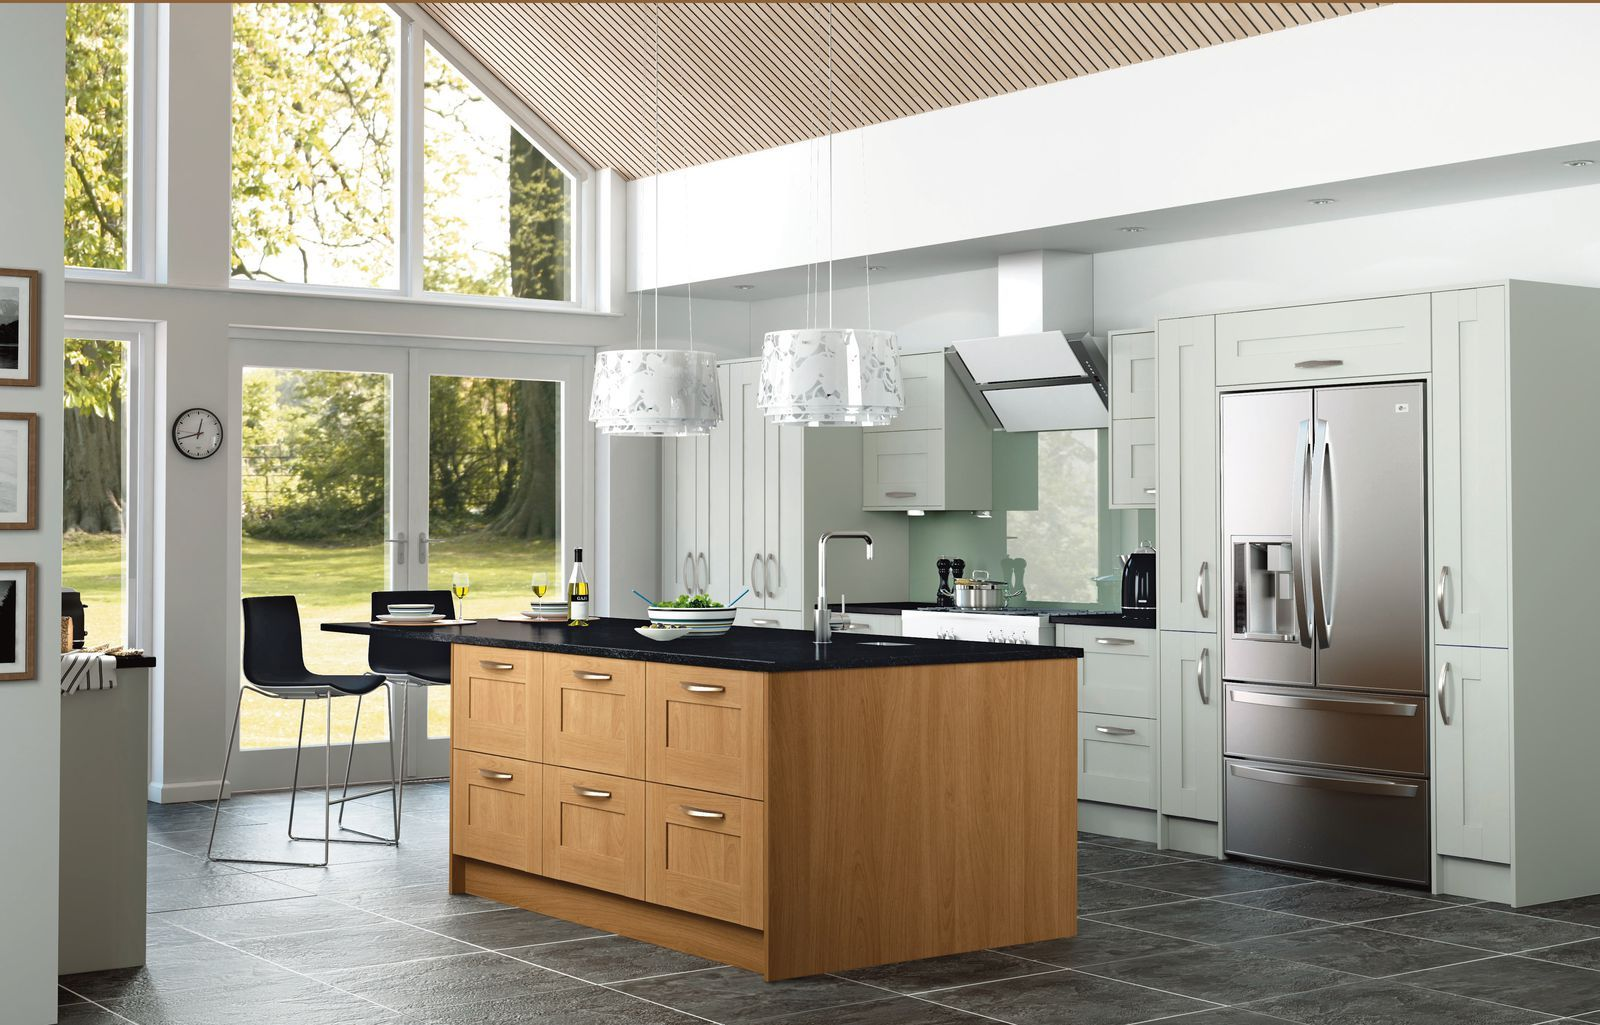 Hehku Kitchens  Visit Our Hehku Kitchen Showroom For Kitchen Captivating Kitchen Design And Installation Decorating Inspiration